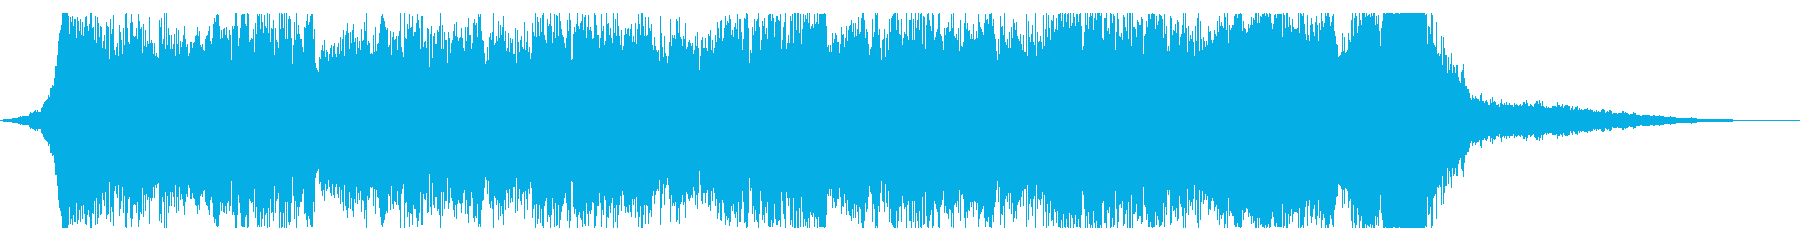 KANTホラー切迫感BGM200815の再生済みの波形